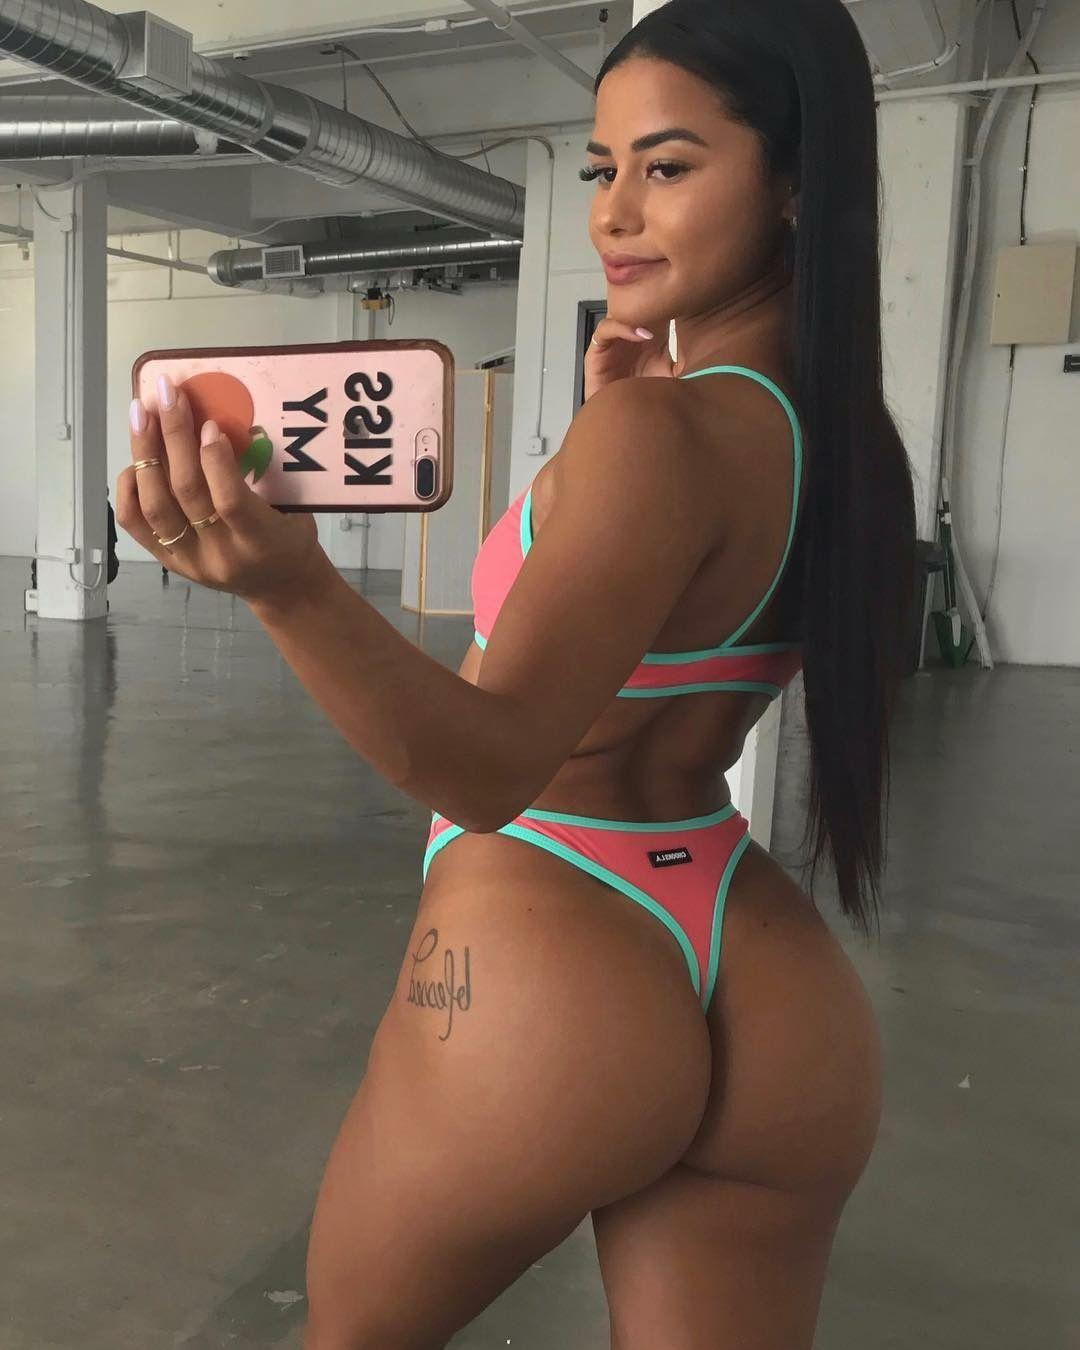 Linda hogan sexy nude (26 photos), Instagram Celebrity pic